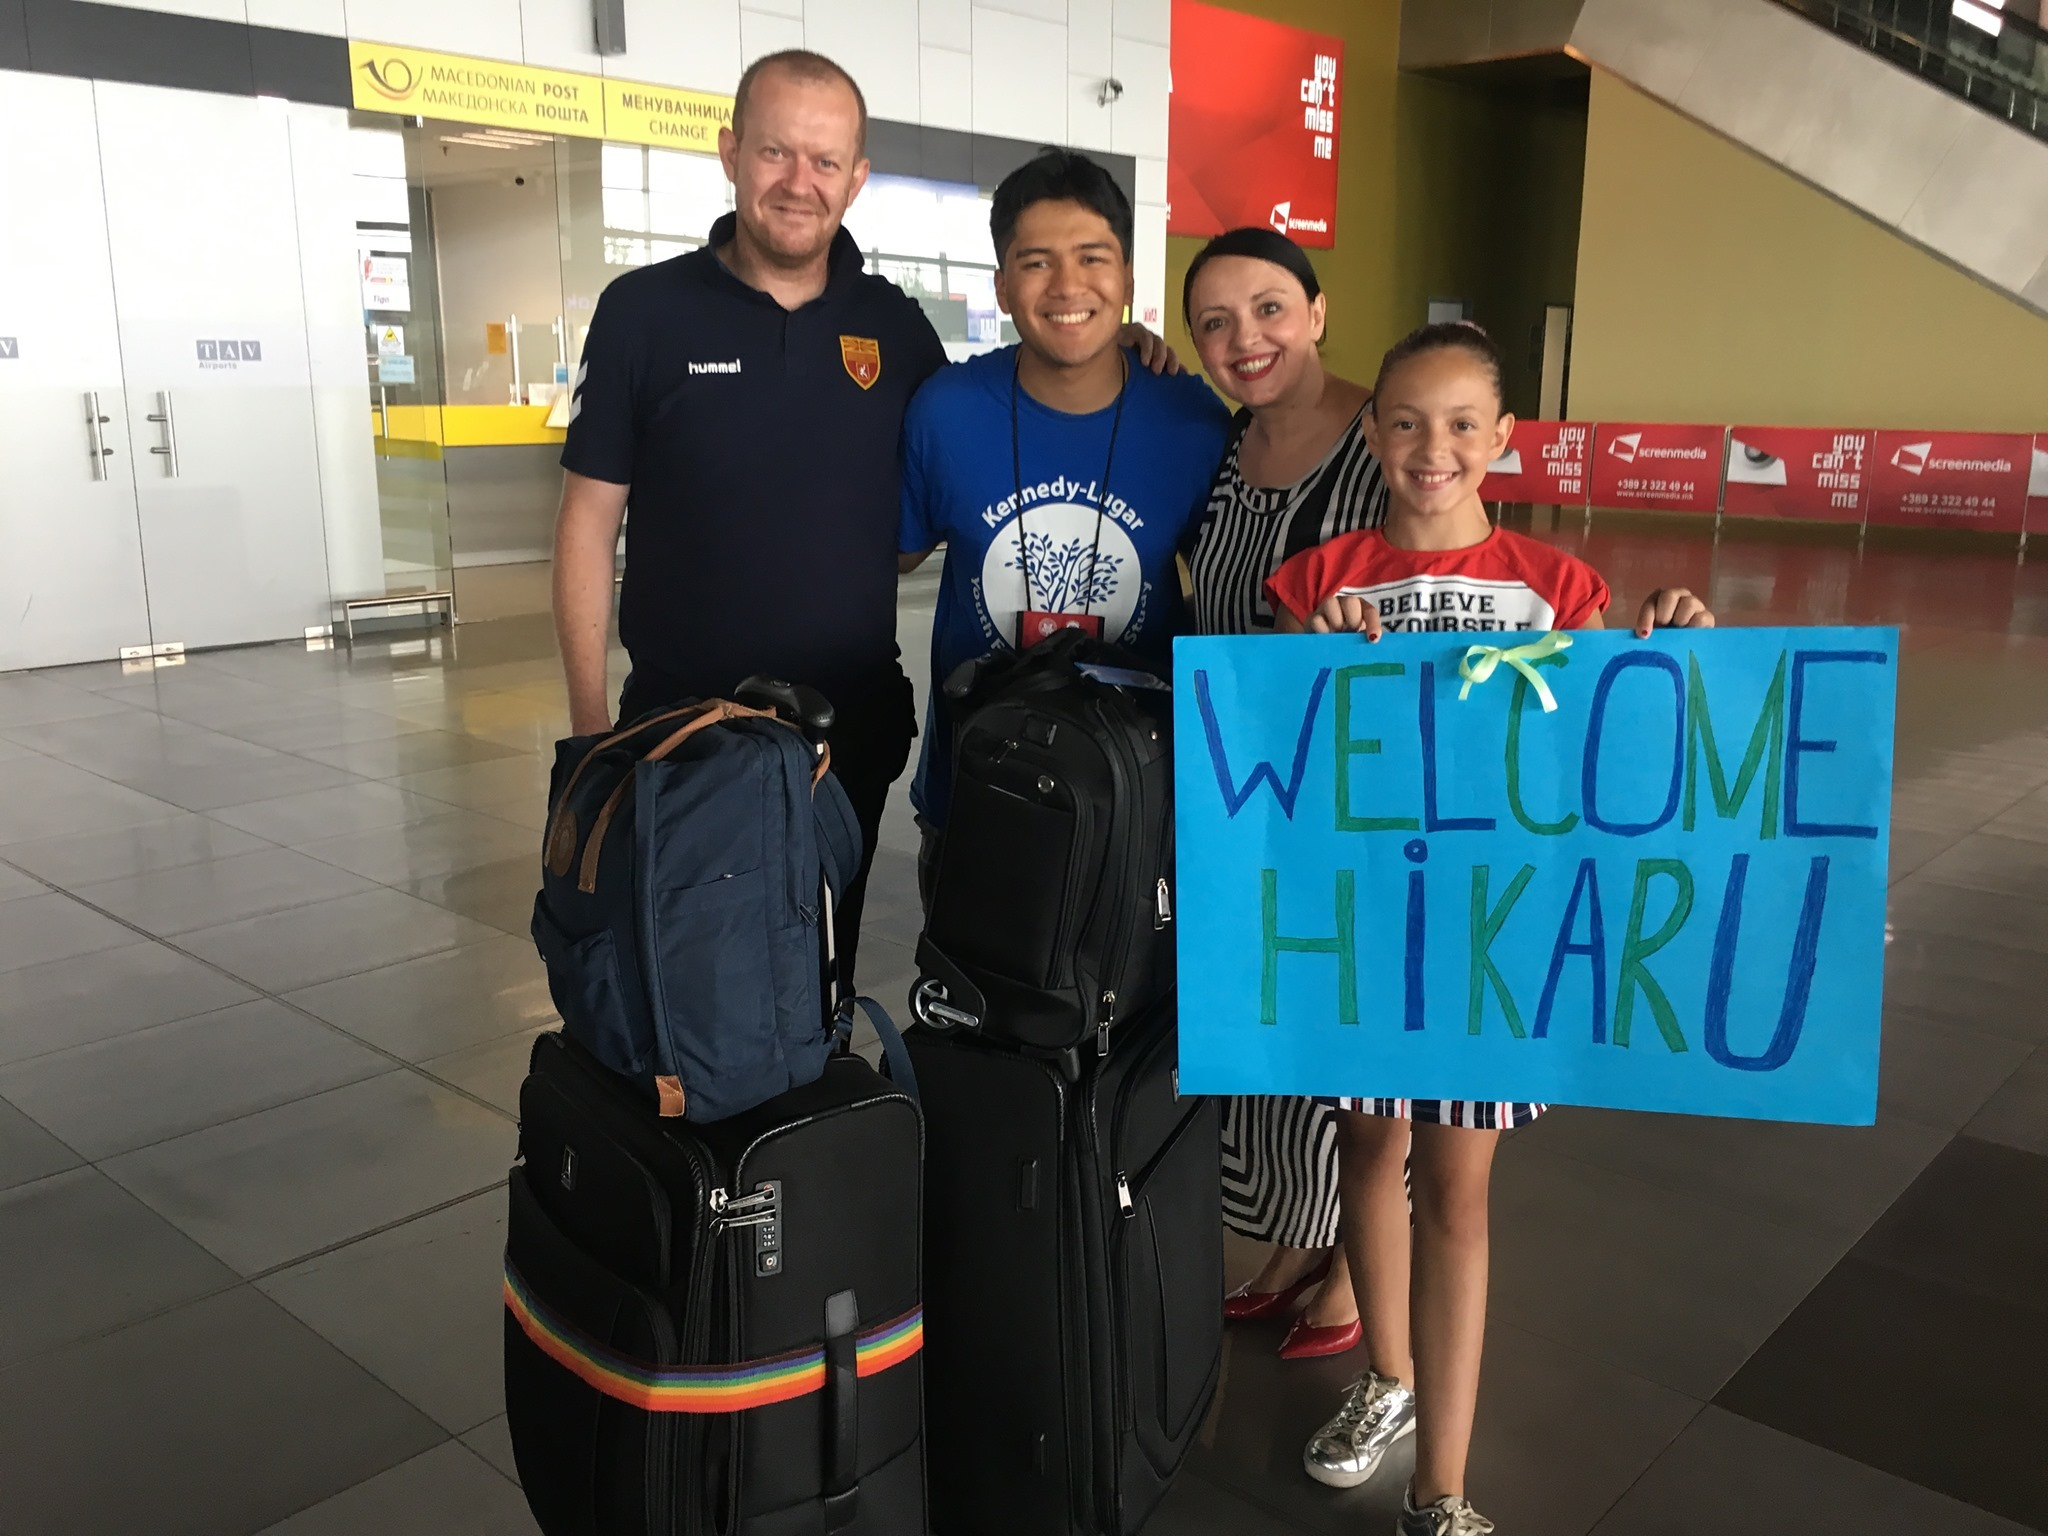 Hikaru And Hf